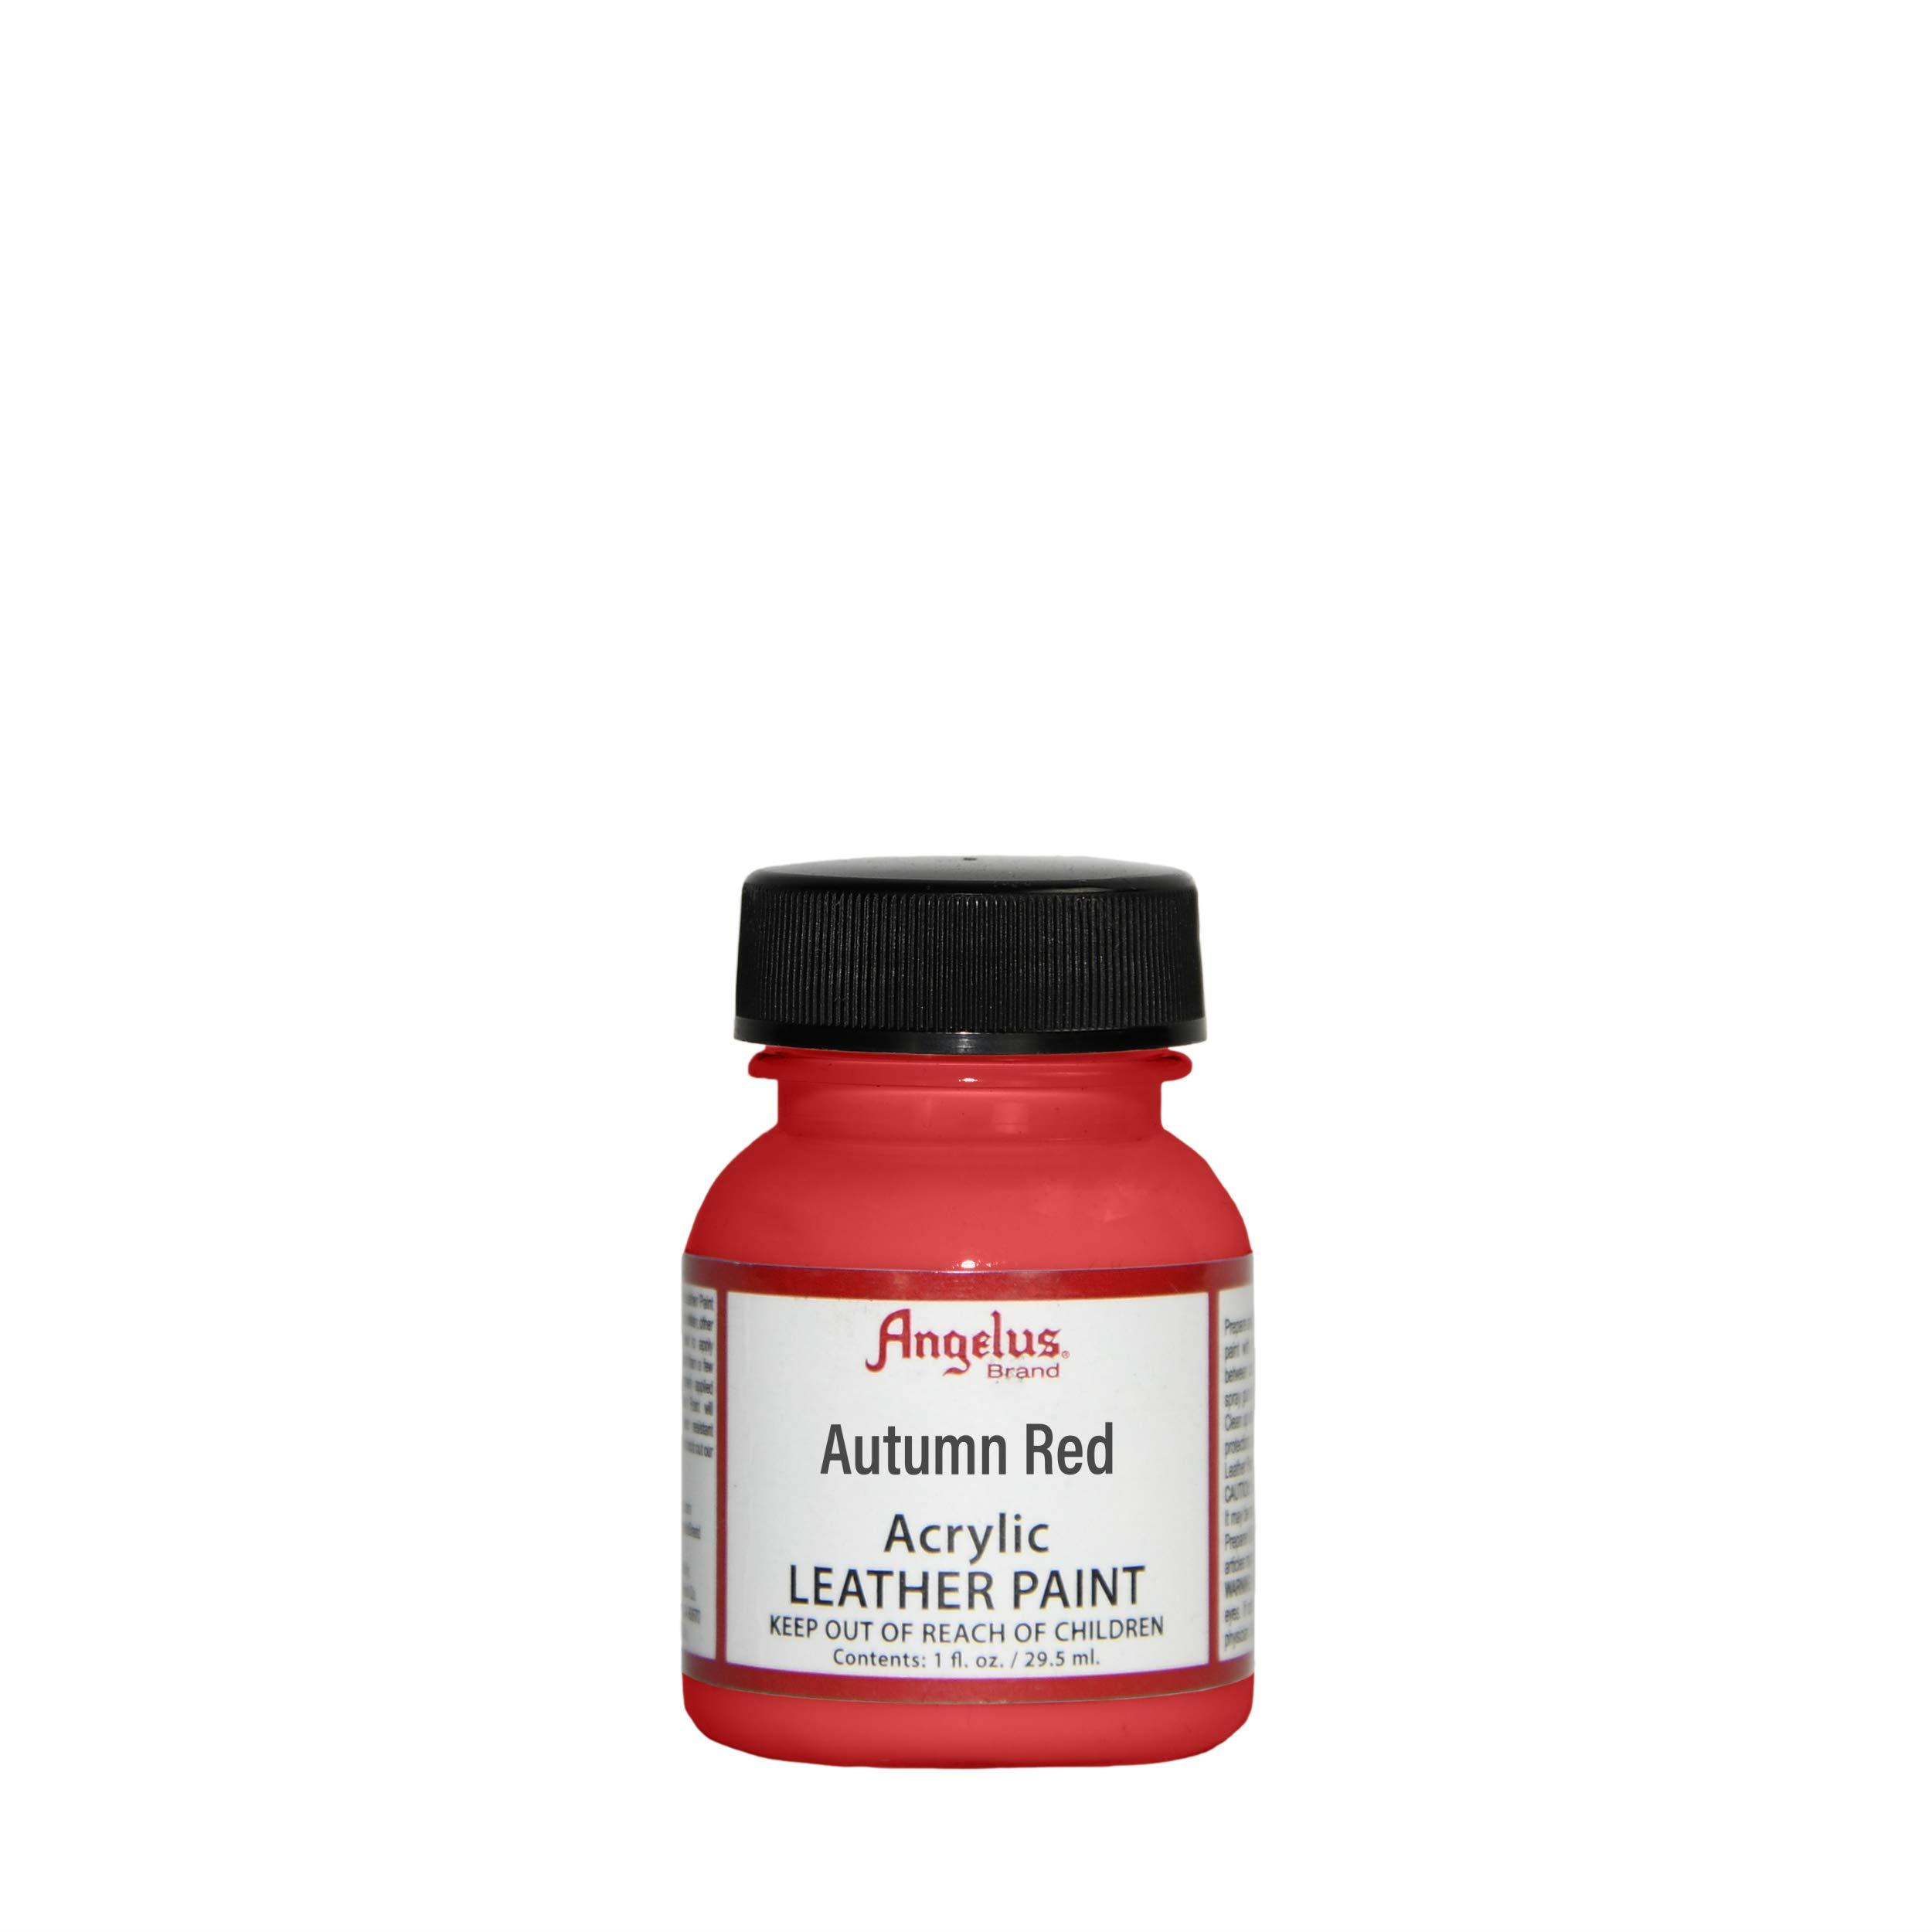 Angelus Pintura acrílica para cuero rojo otoño 118ml